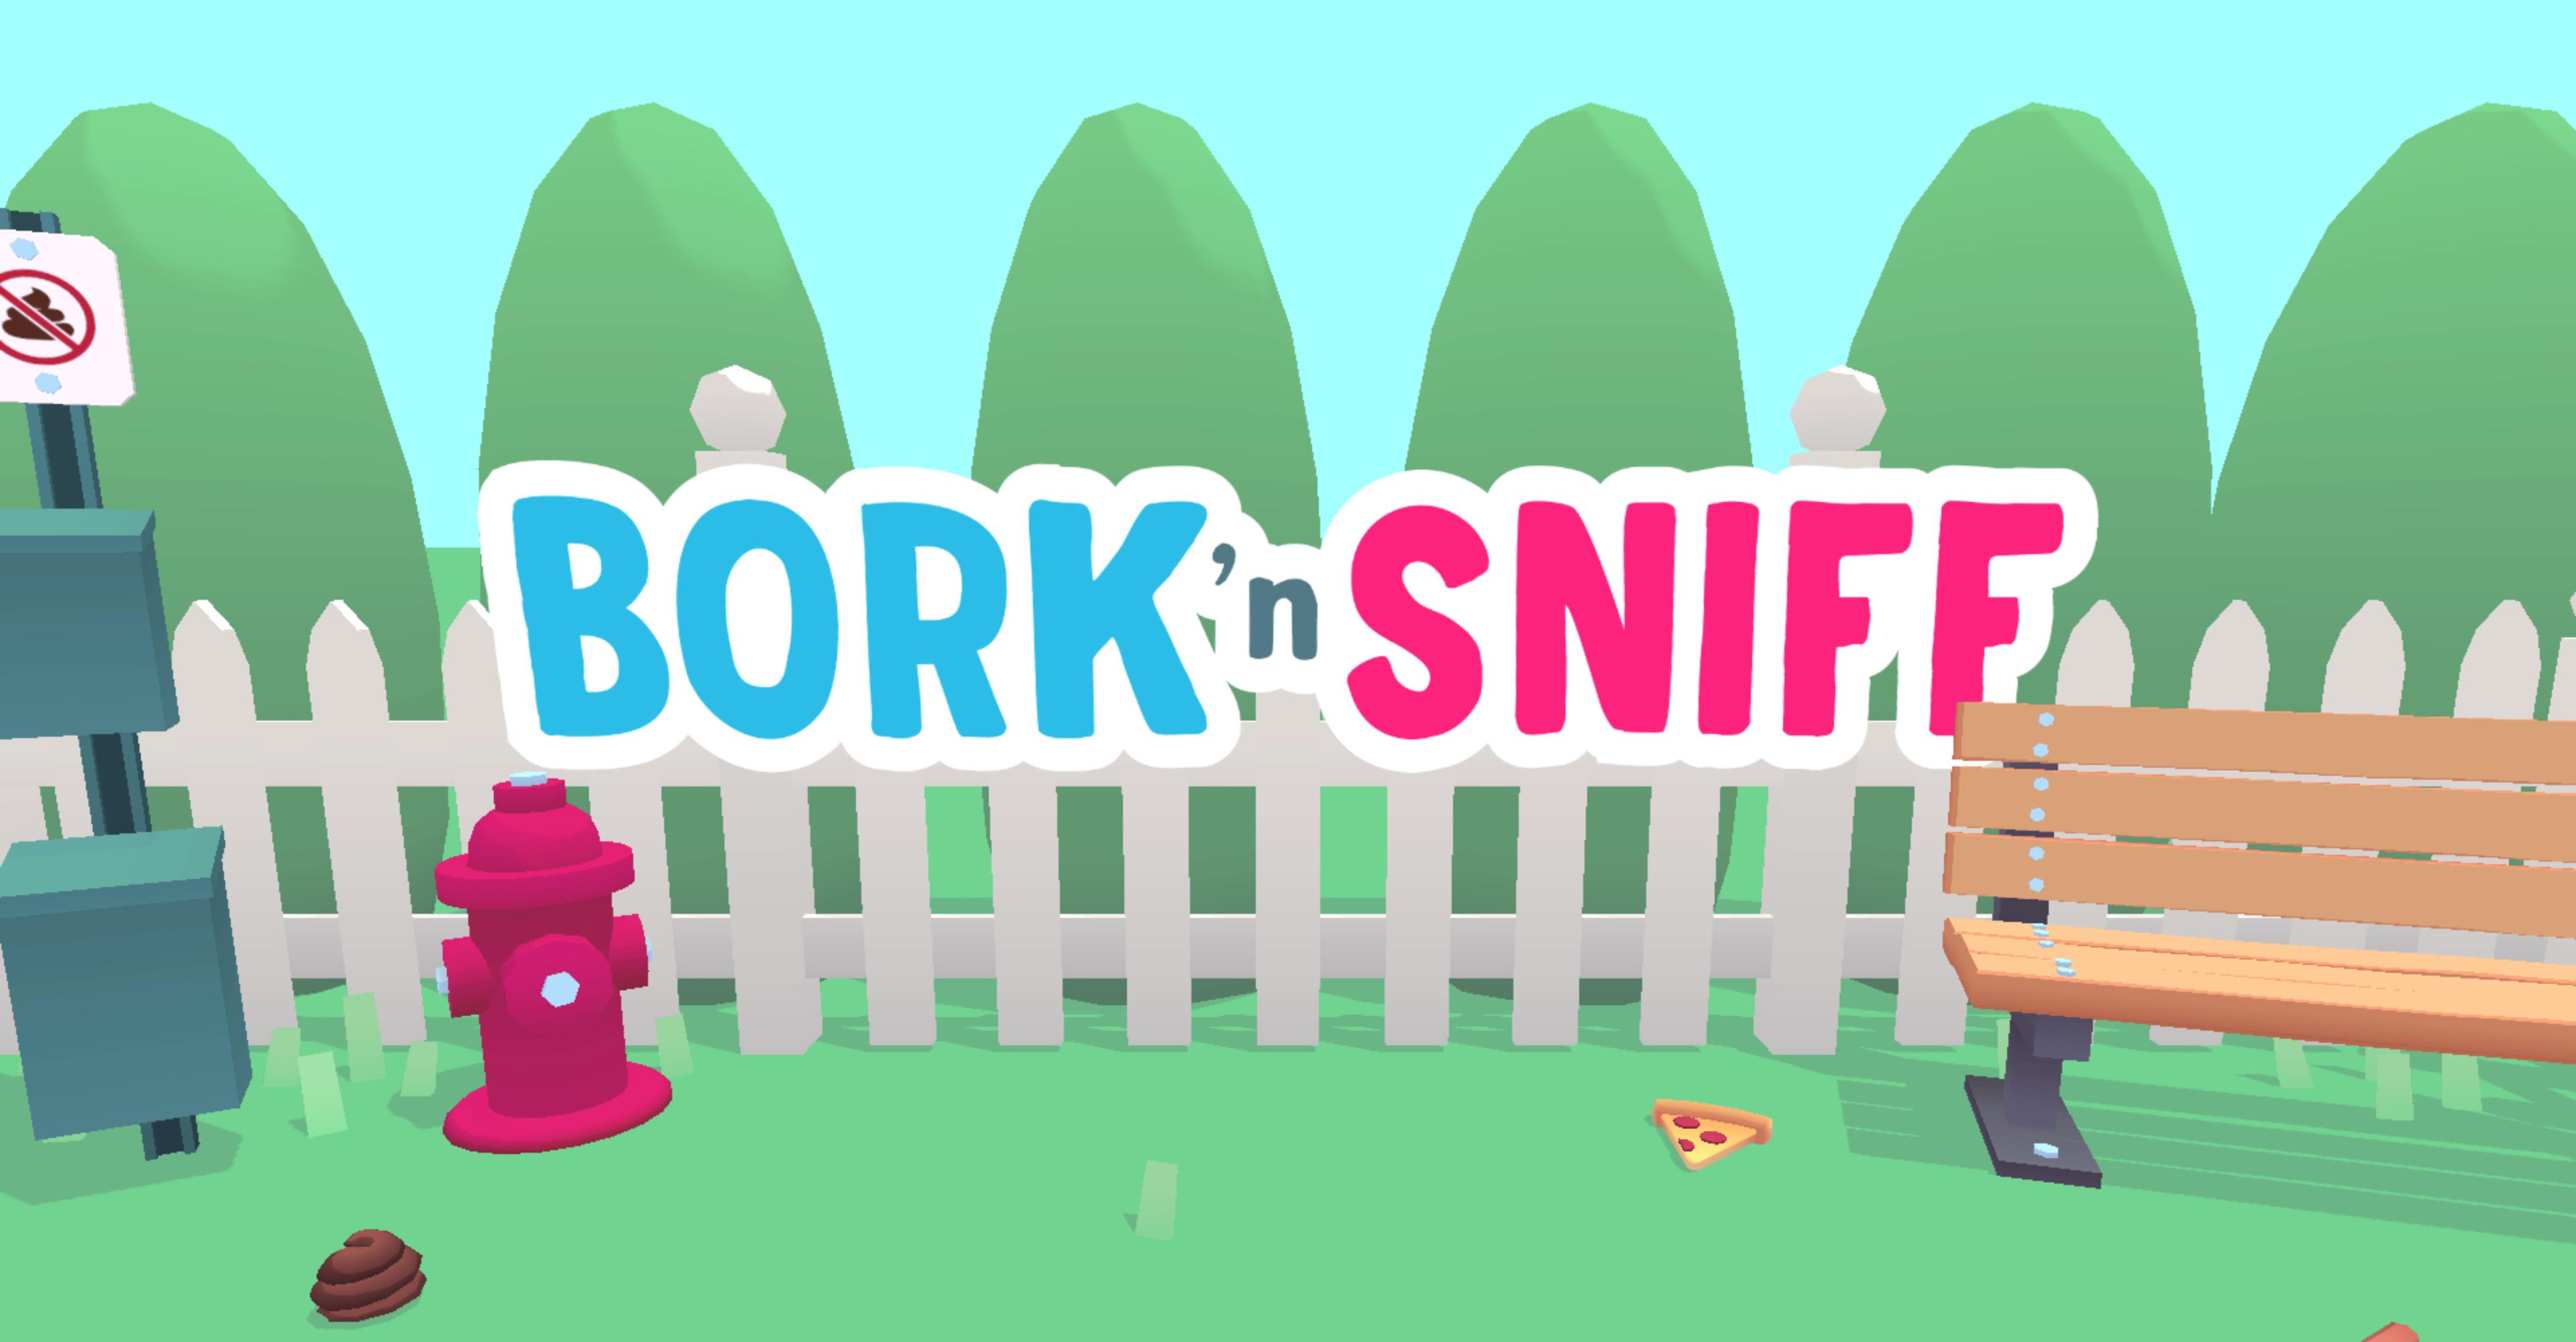 Bork 'n Sniff